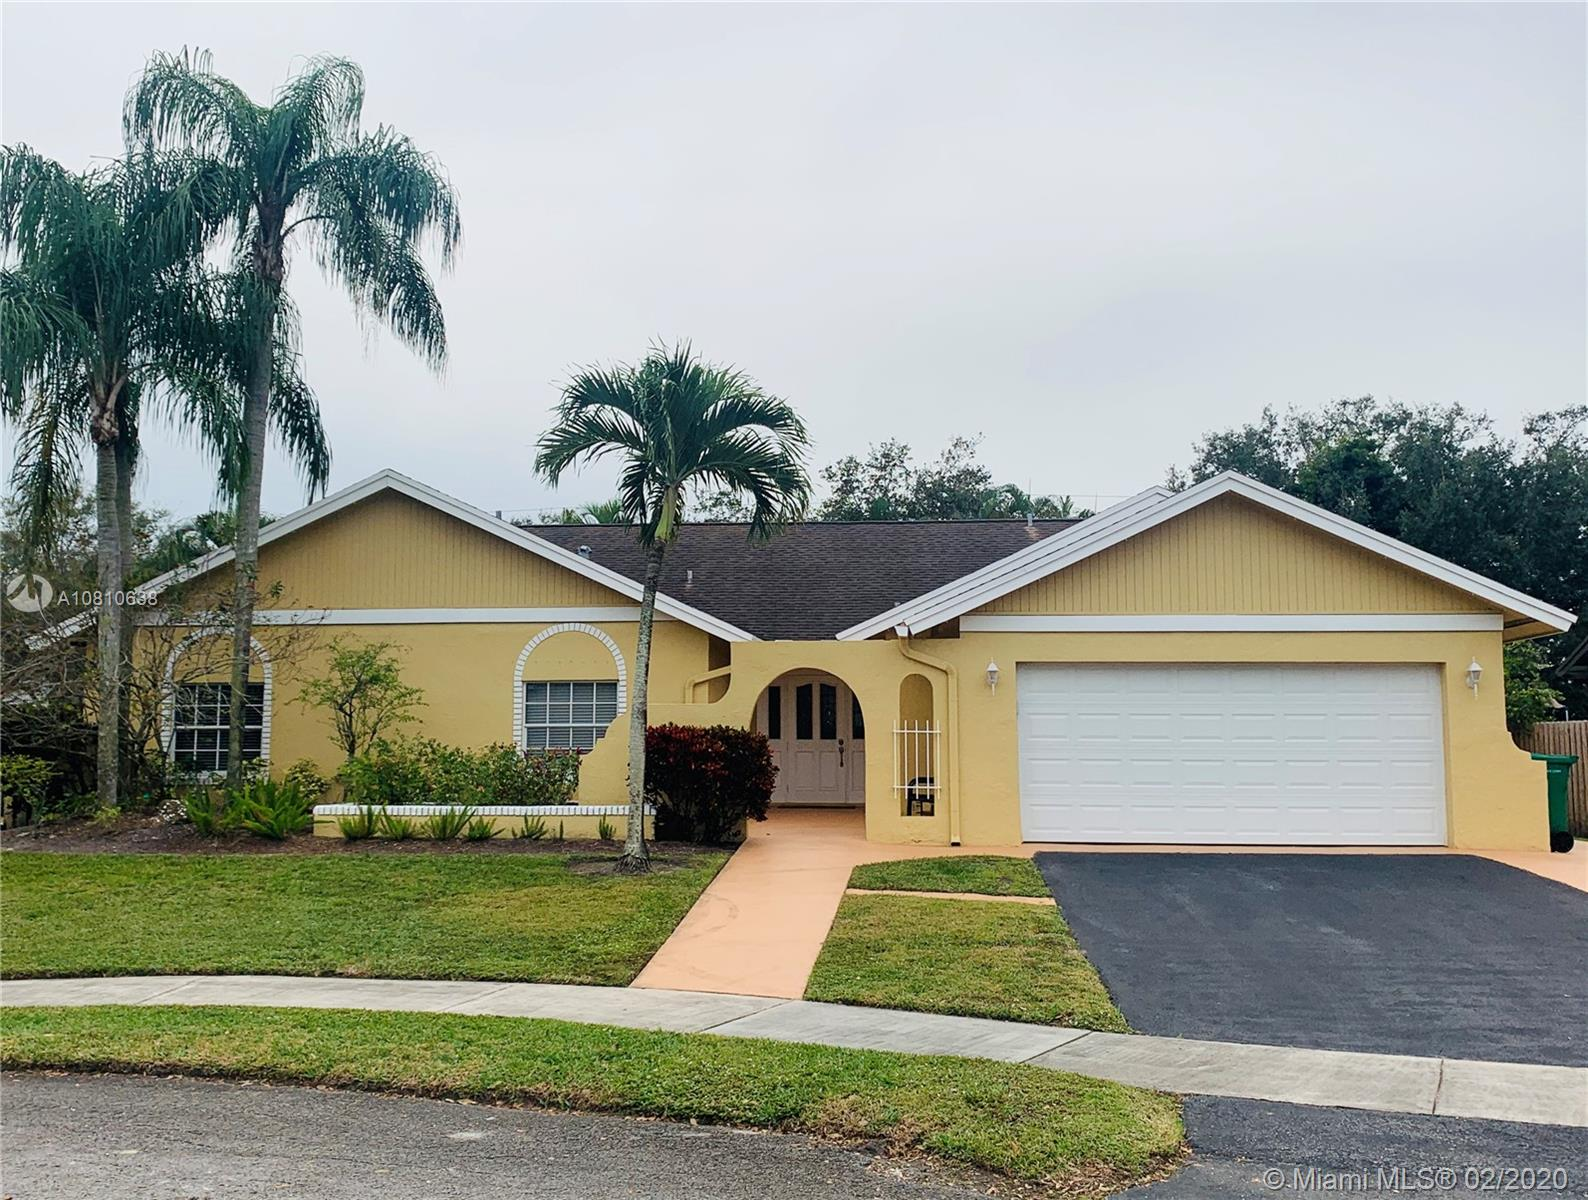 11802 SW 59th Ct, Cooper City, Florida